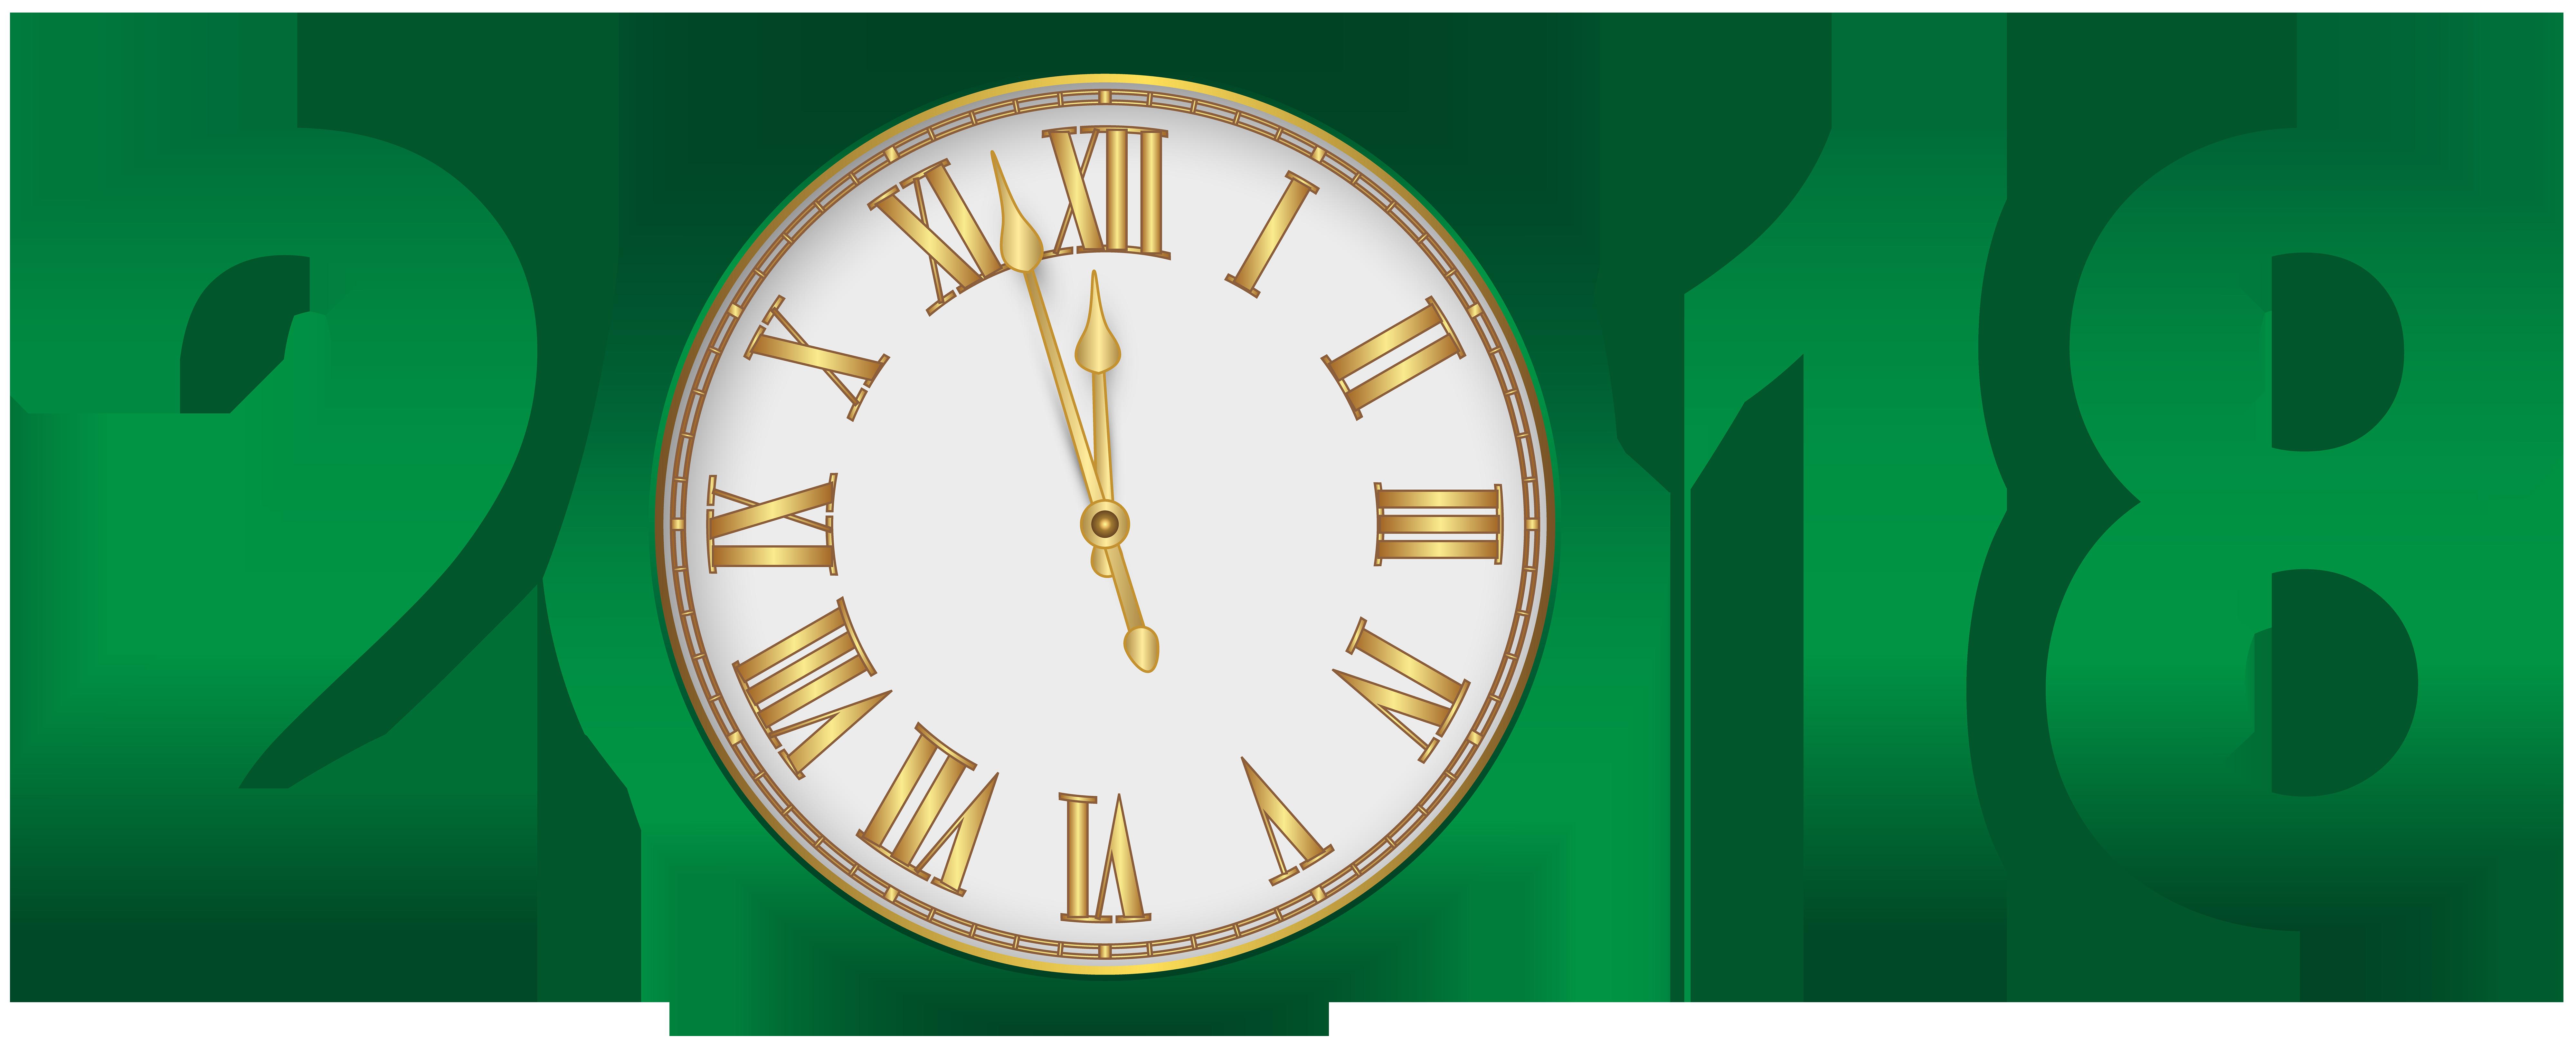 green clock transparent. Clocks clipart spring